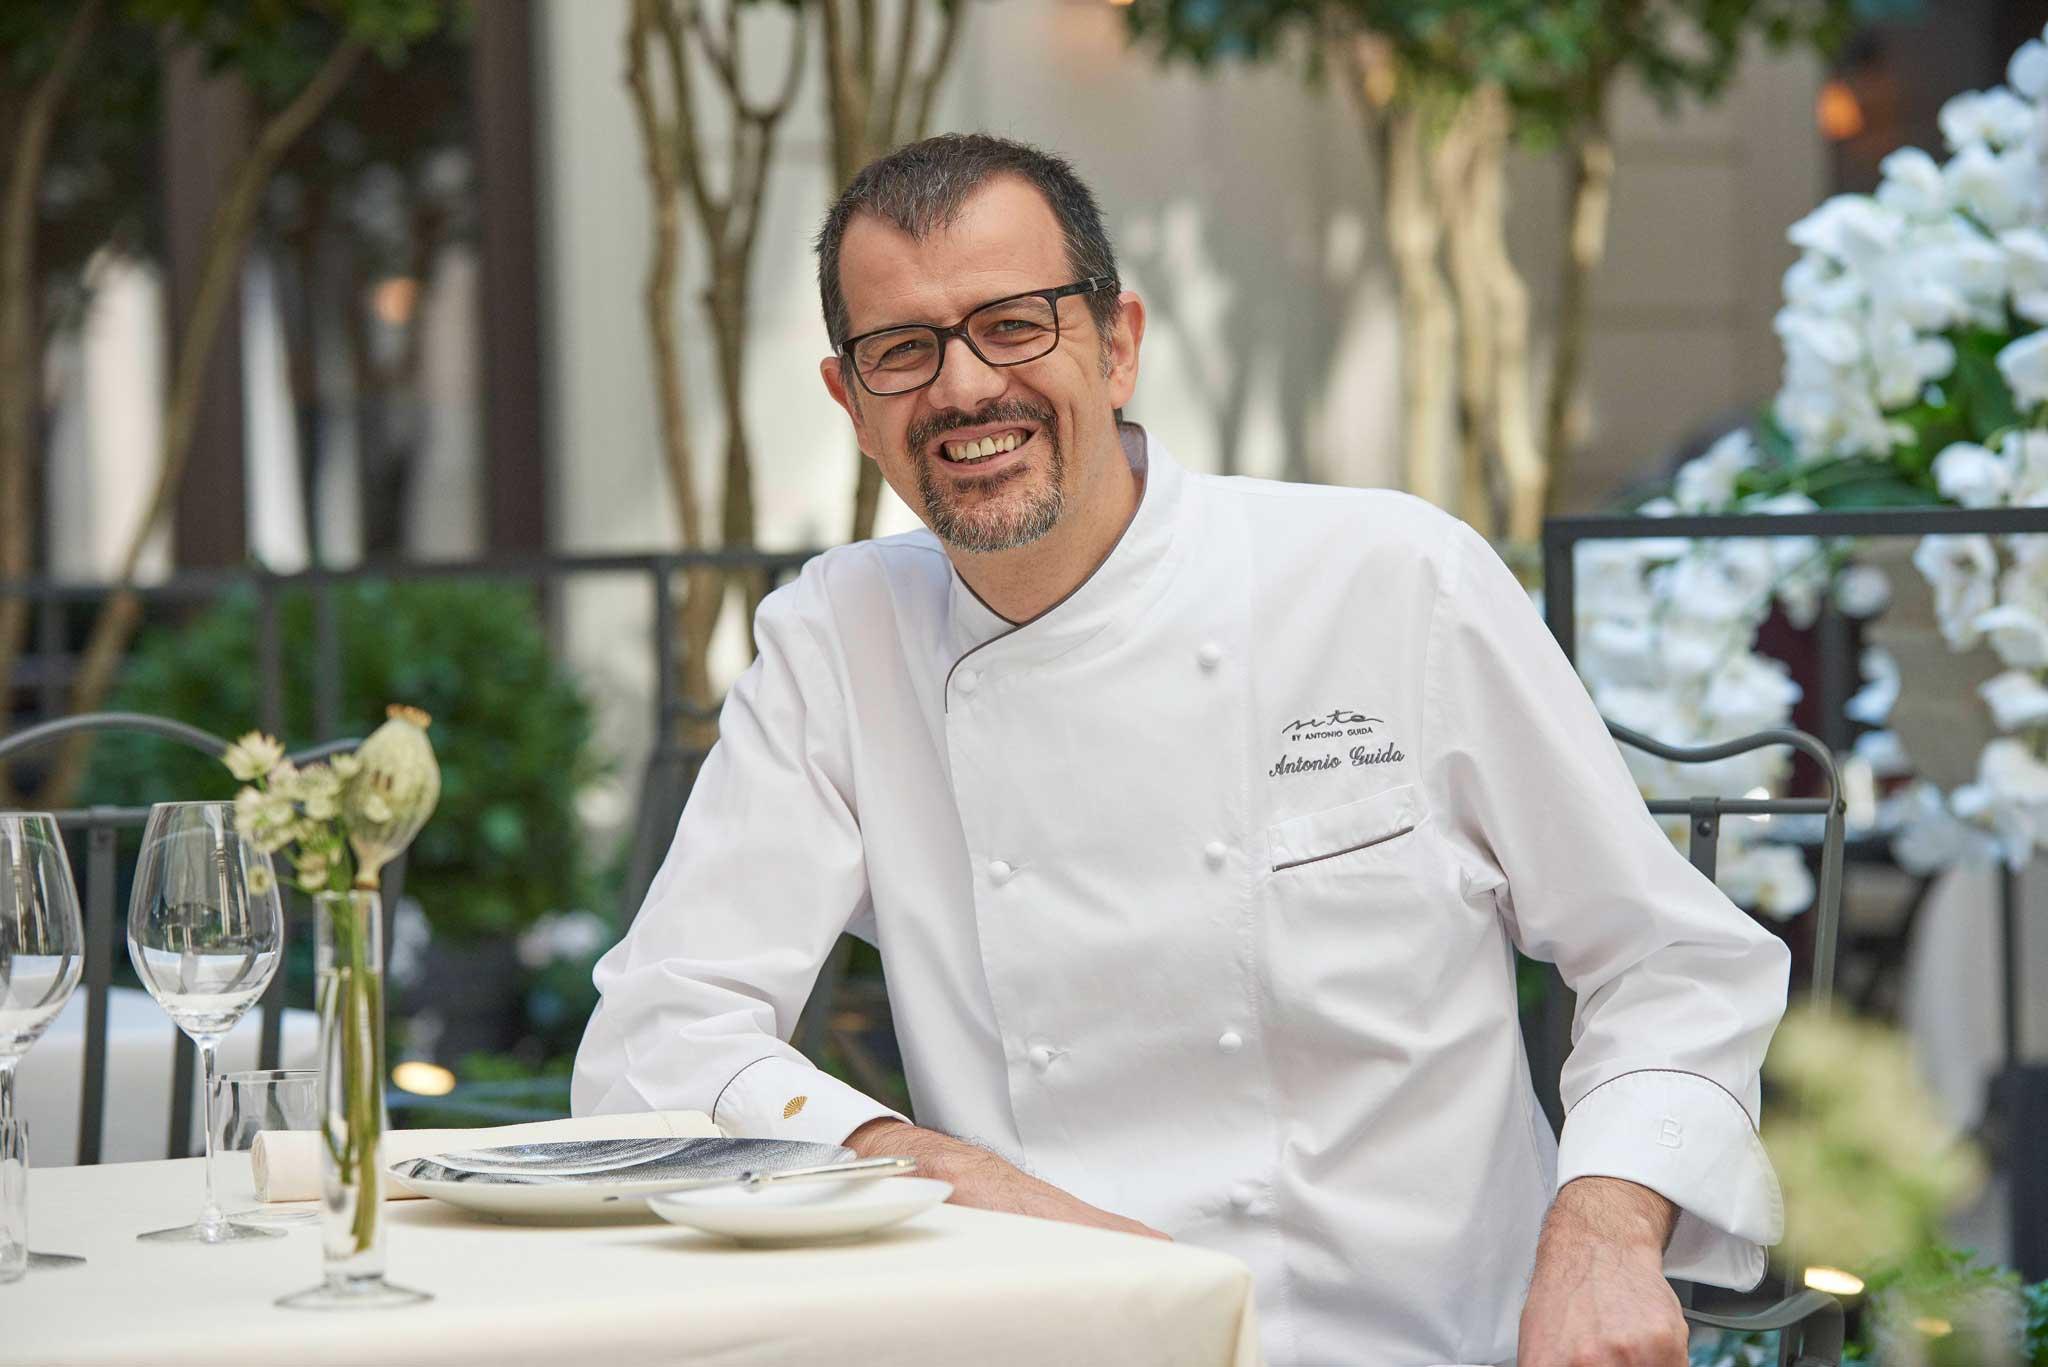 Antonio Guida chef